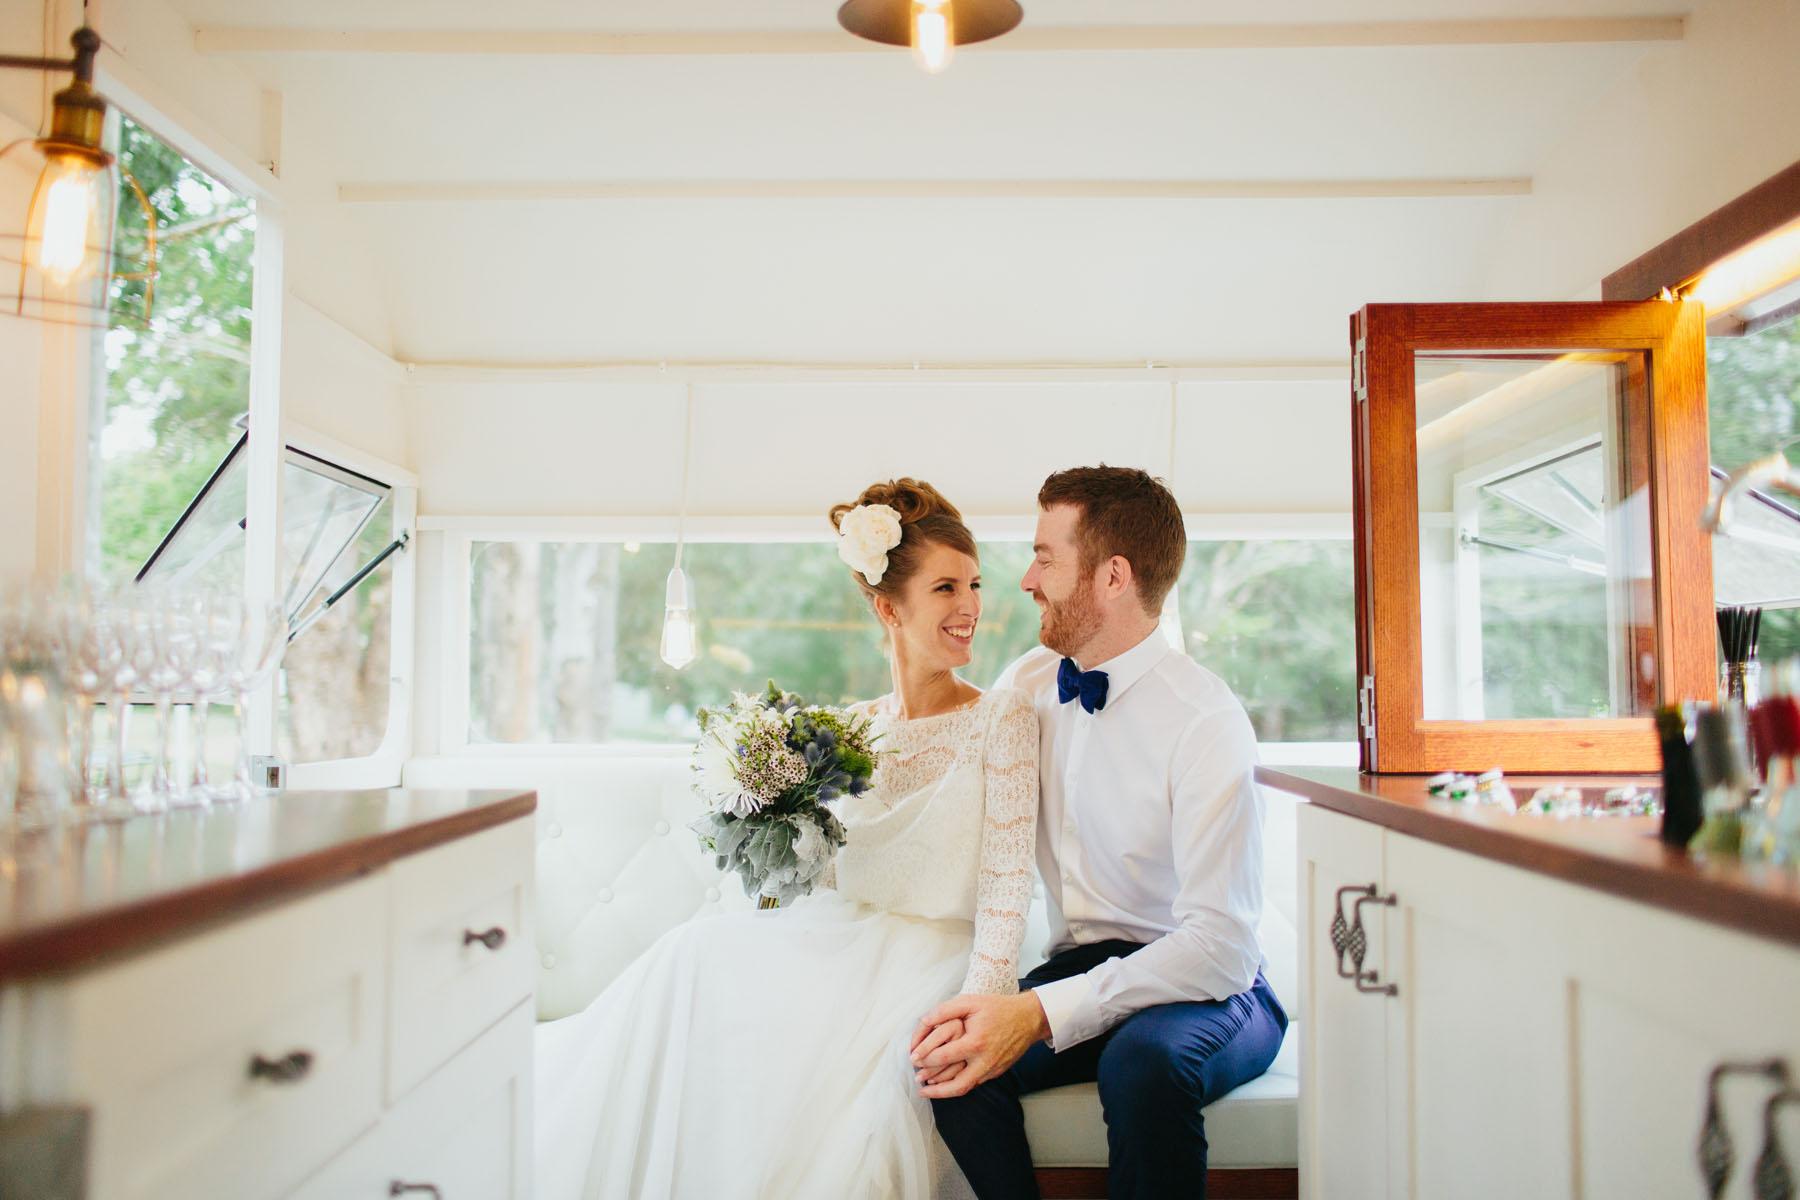 19_midginbill hill wedding .jpg